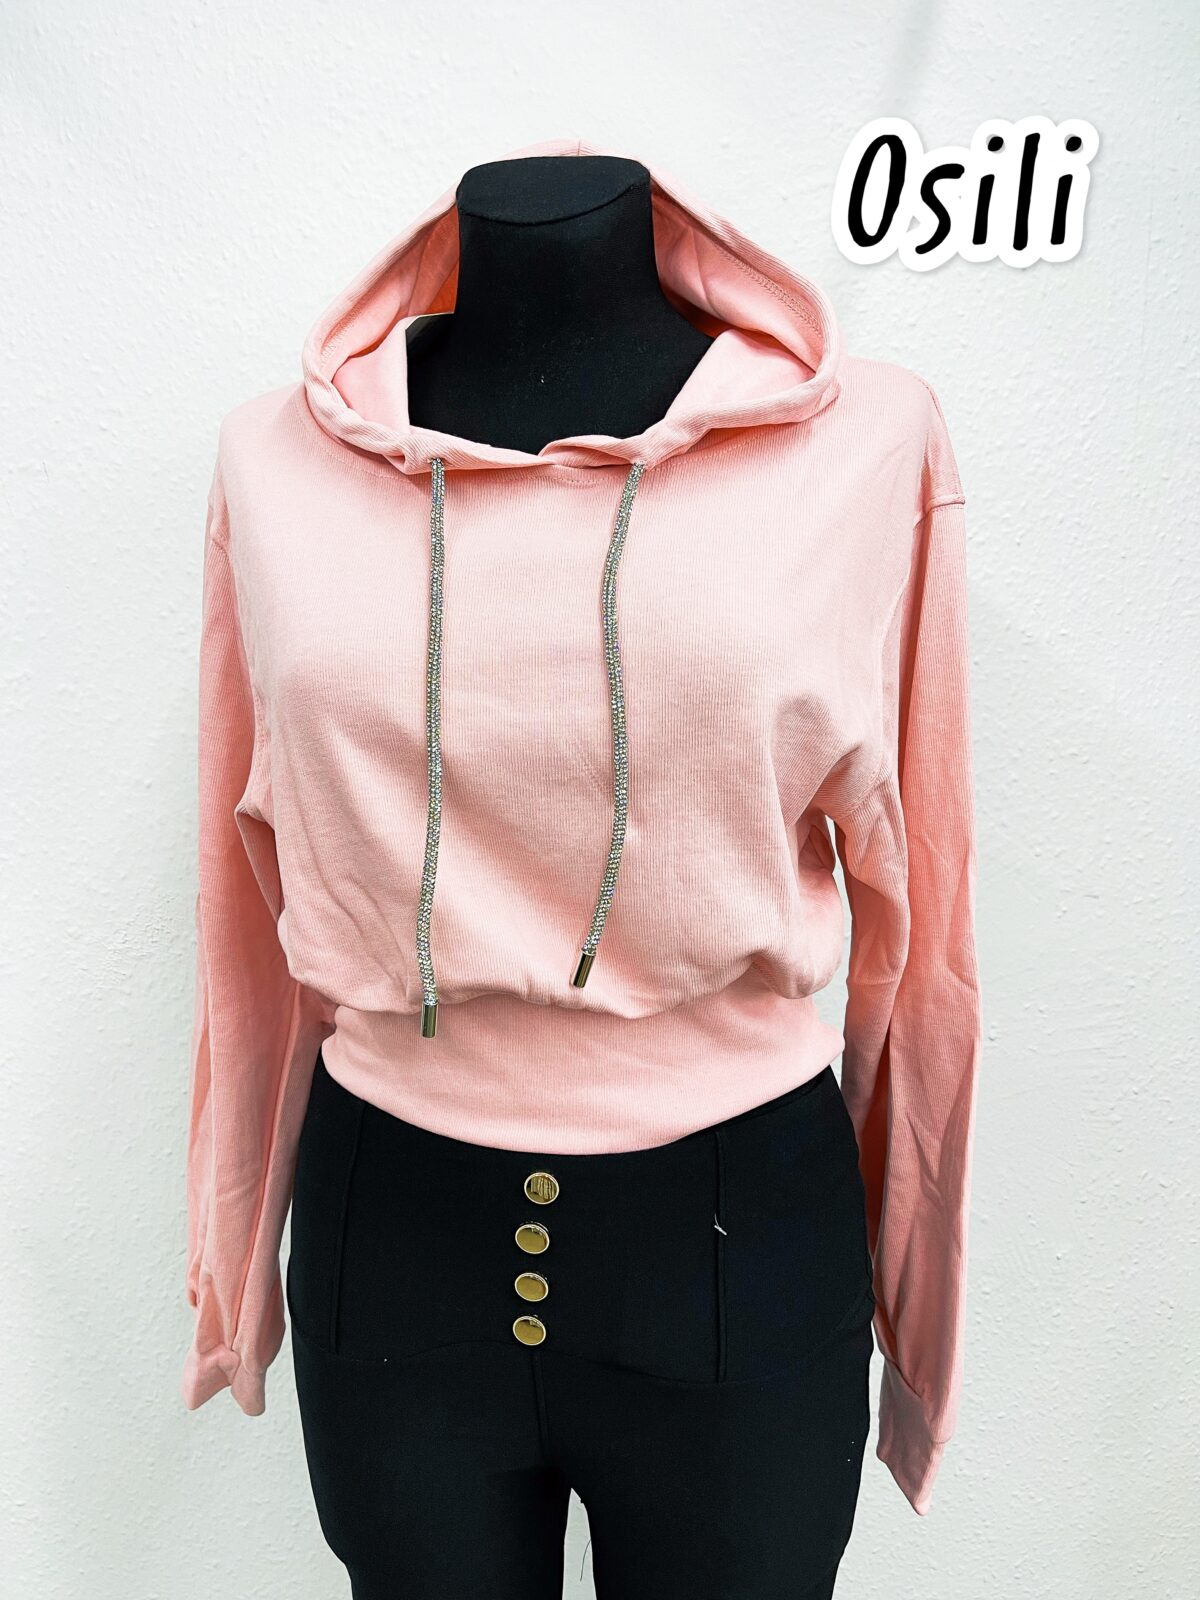 F7B0519A DF40 4915 A82D B24B08EFC3A2 scaled Osili - Fashion - Divat